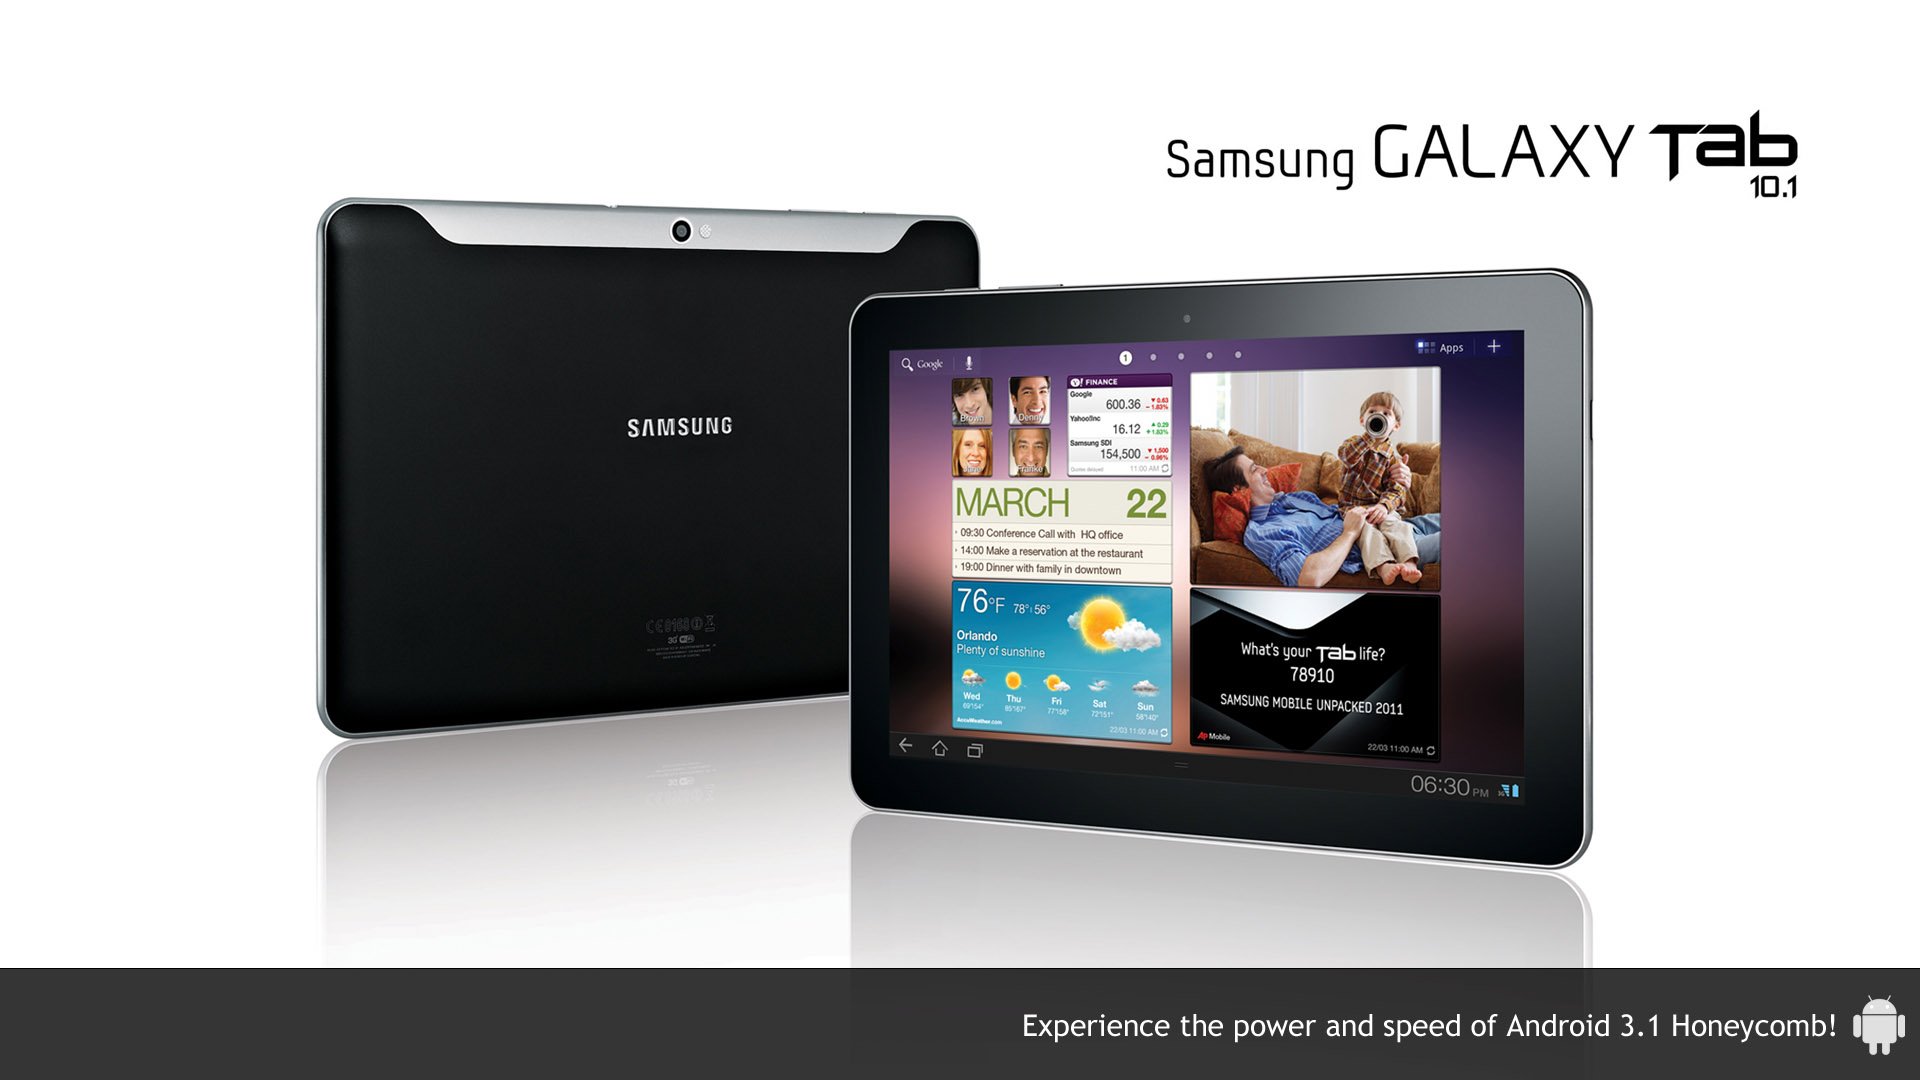 android 31 on samsung galaxy tab 101 1920x1080